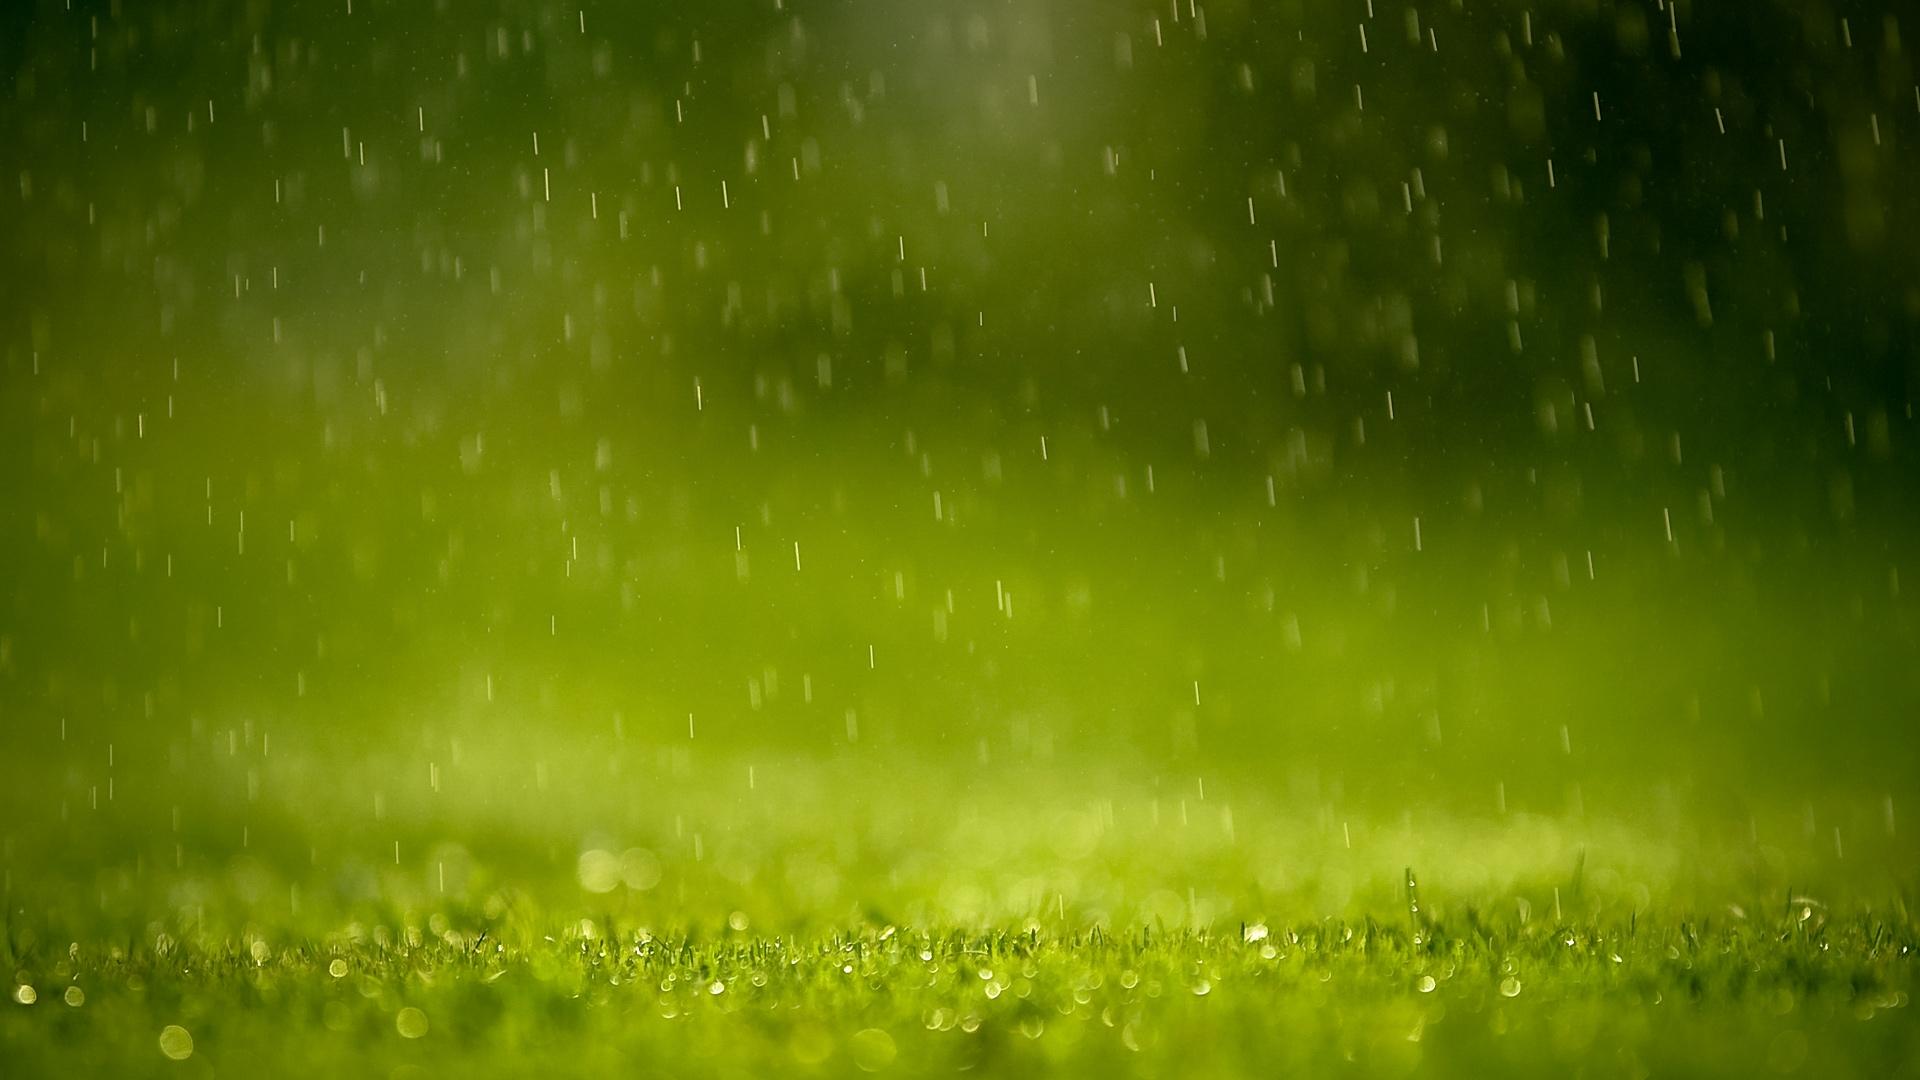 трава, газон, зеленый